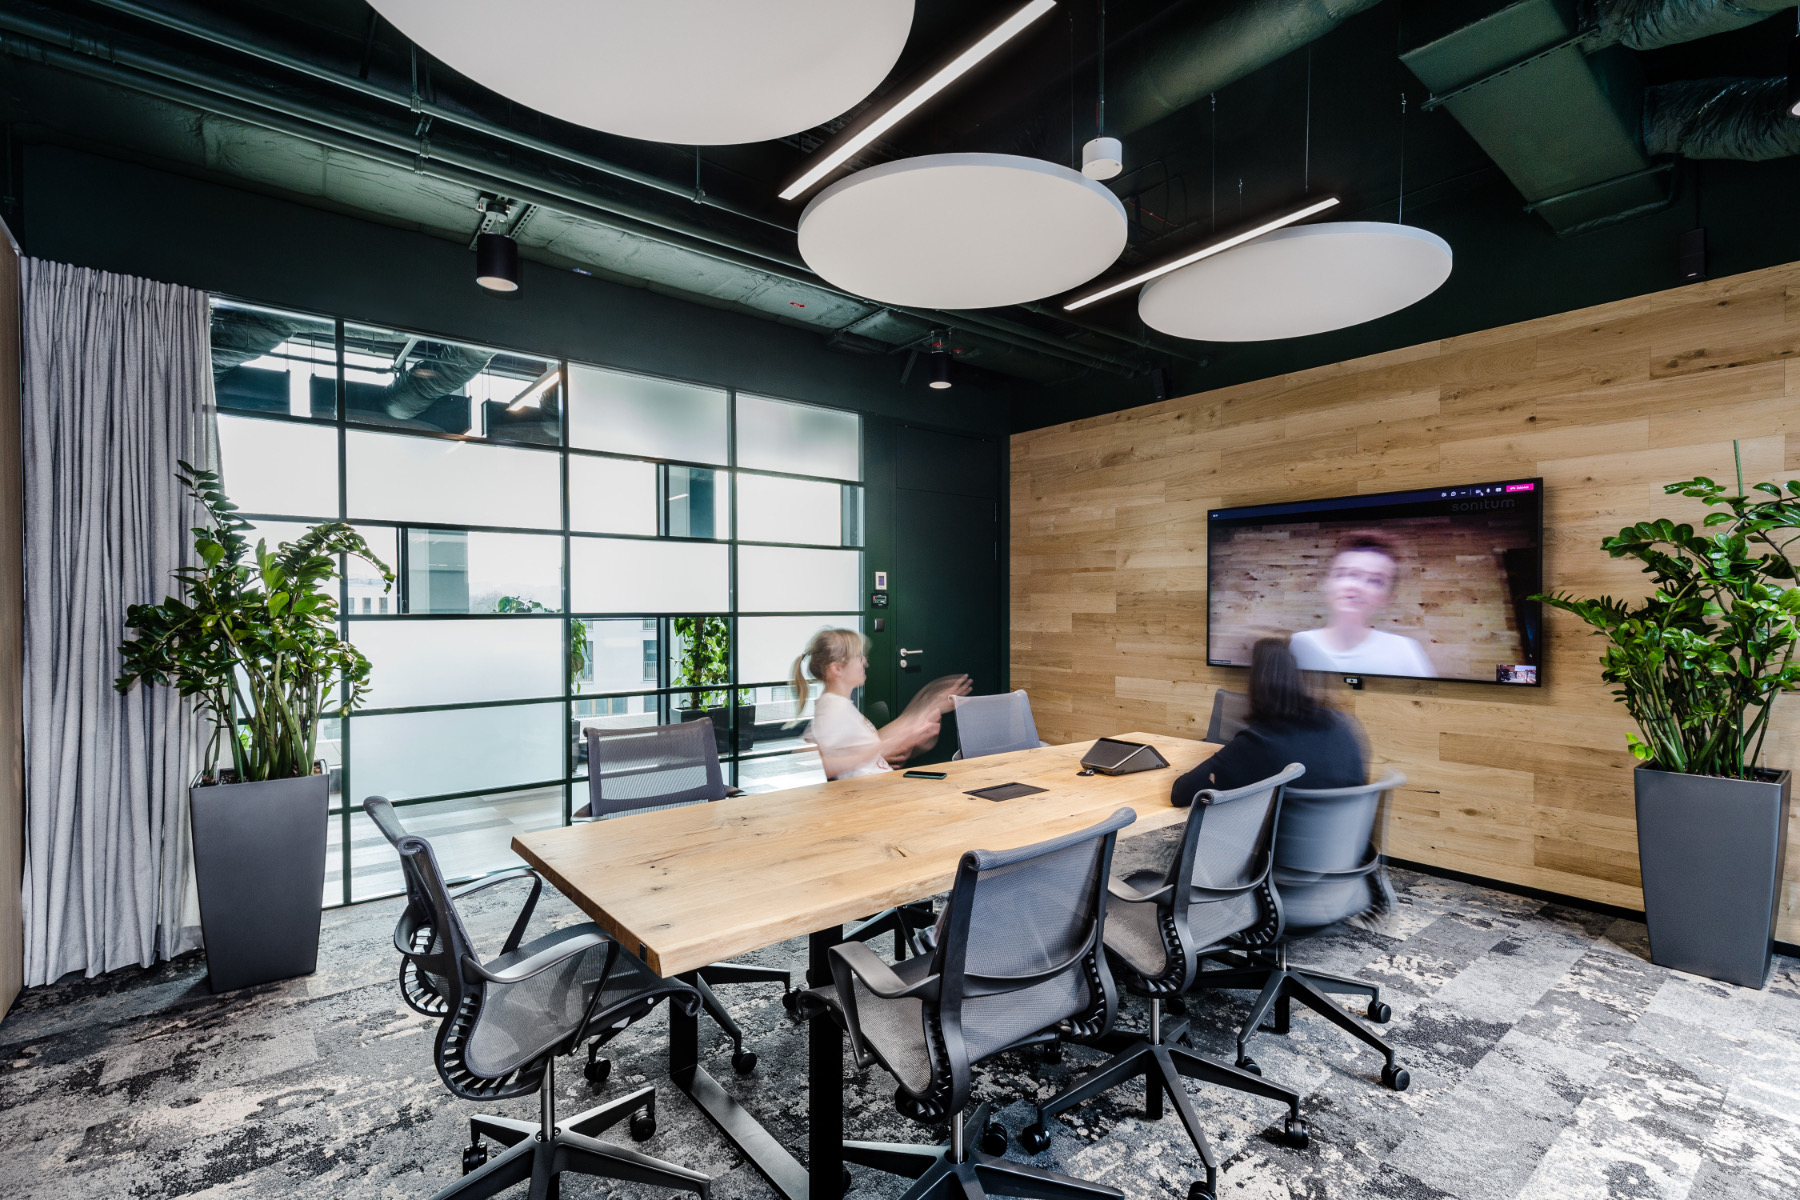 syzygy-warsaw-office-9